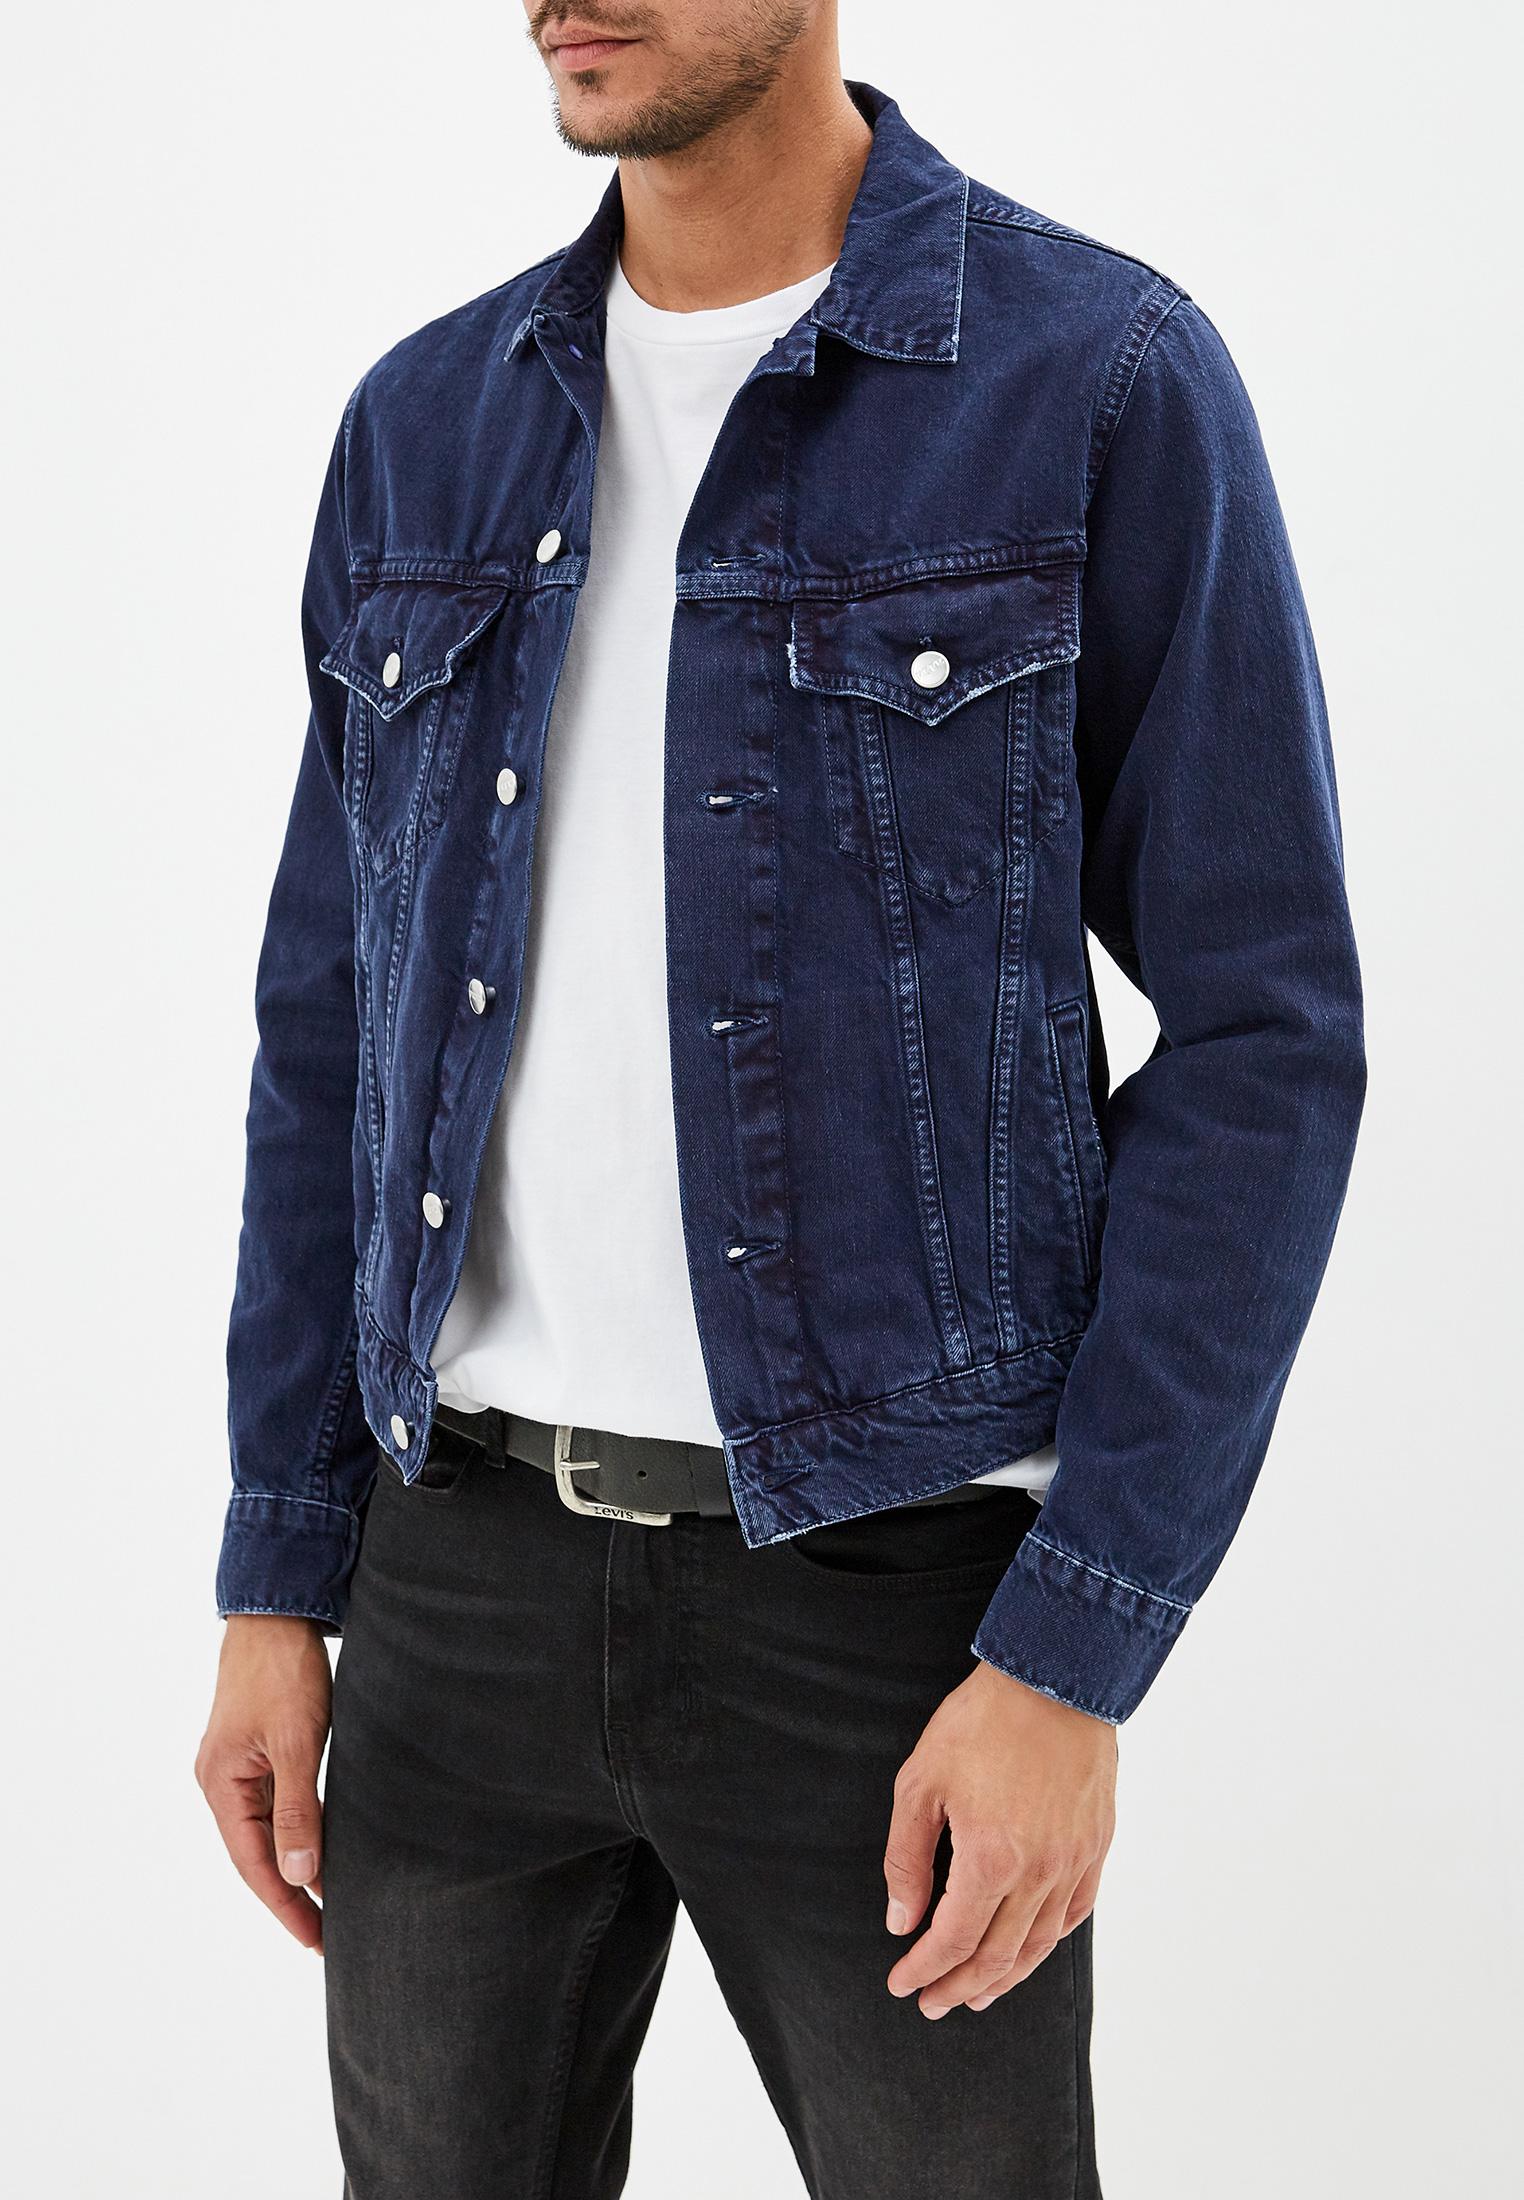 Джинсовая куртка Pepe Jeans (Пепе Джинс) PM402107YD3